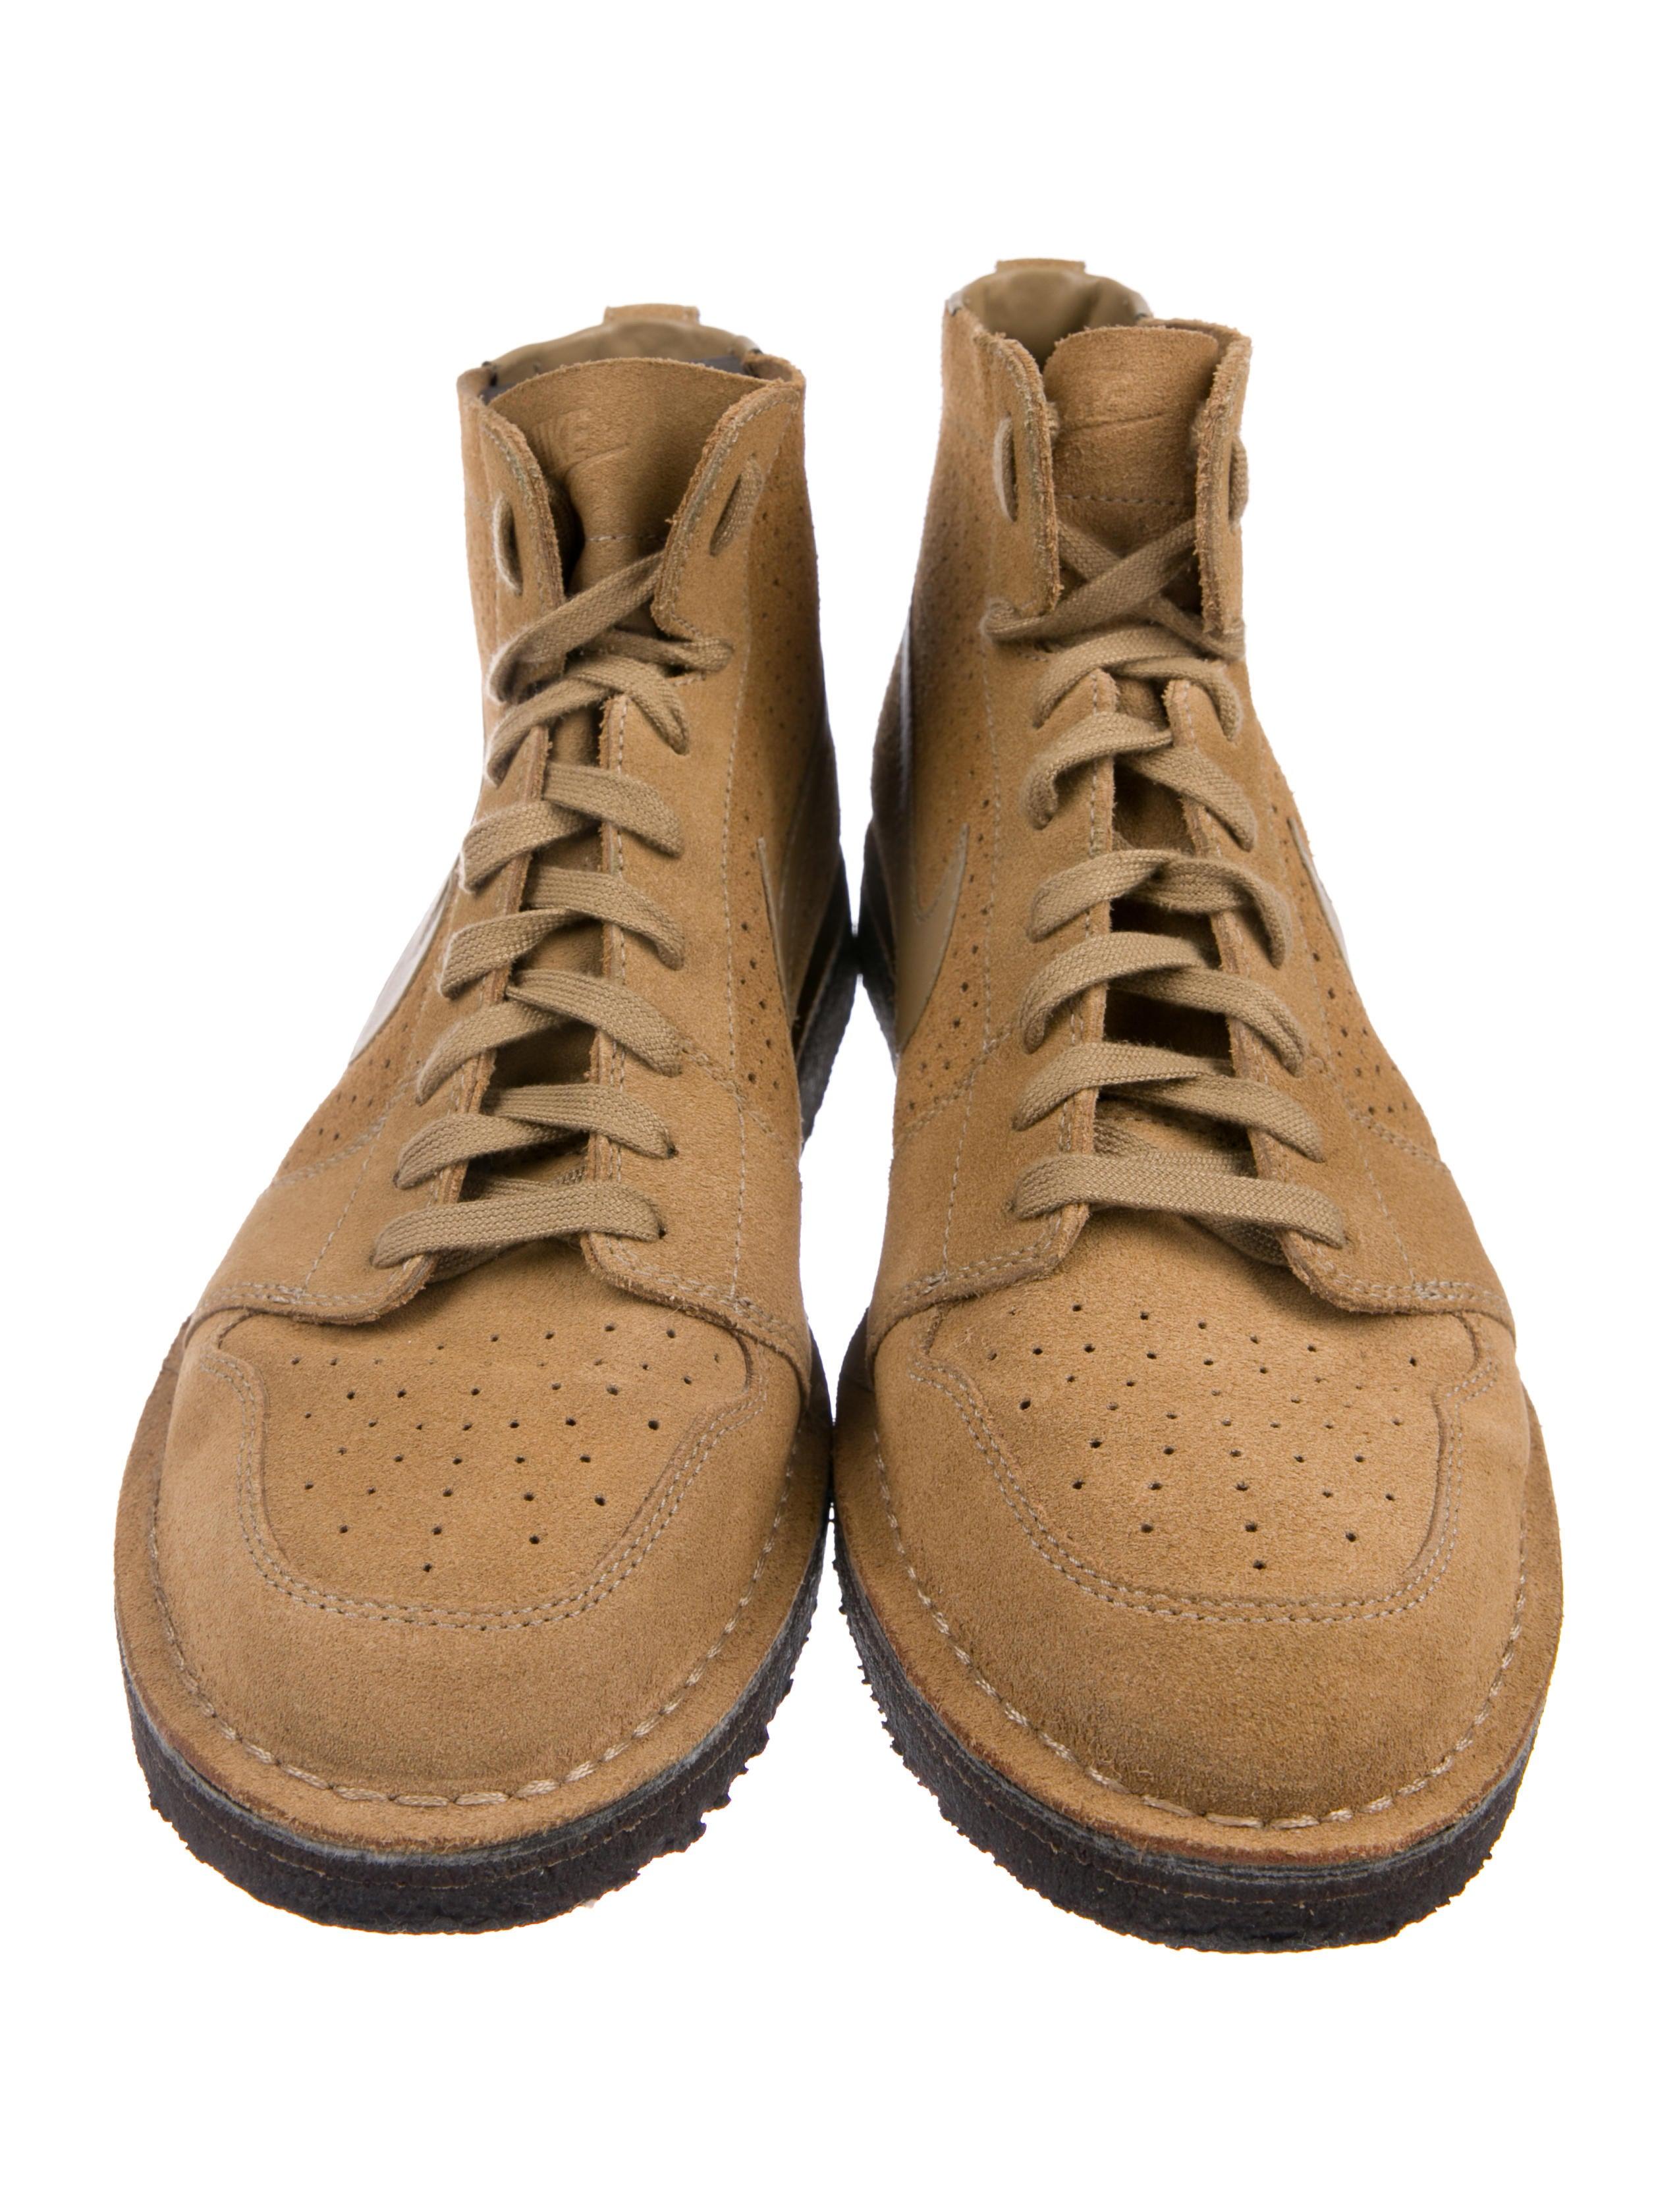 SO TZ Beechtree Mid Shoes Sneakers Air Royal Nike gYfy7Ib6mv